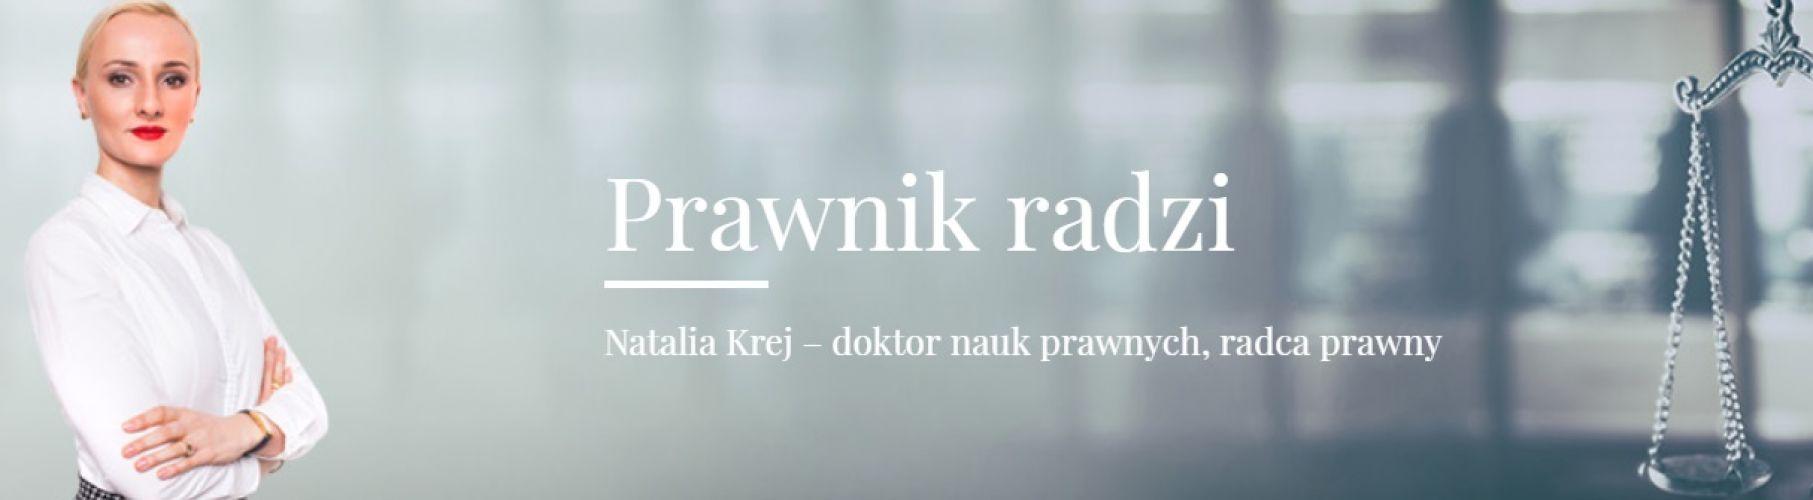 """Prawnik radzi"" – nowy projekt PTS"